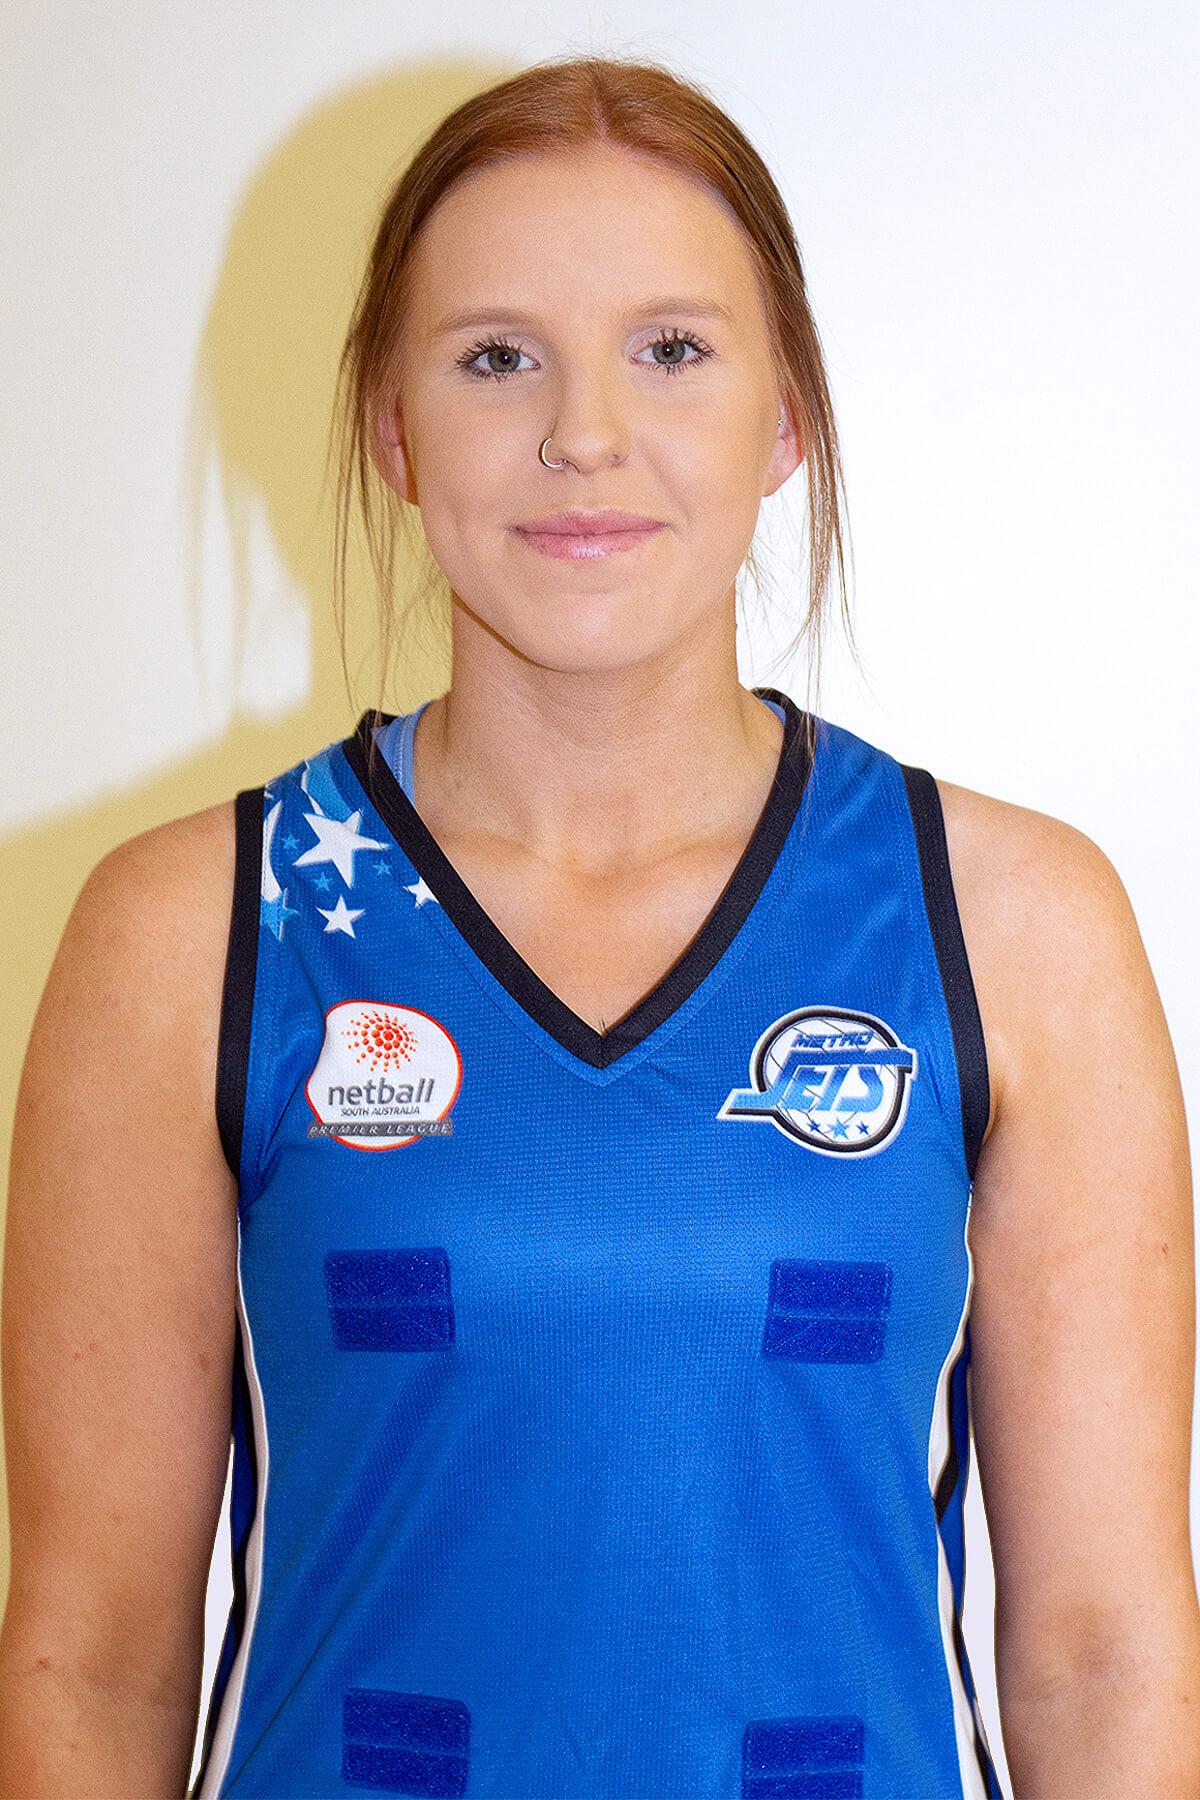 Asha Thurlow